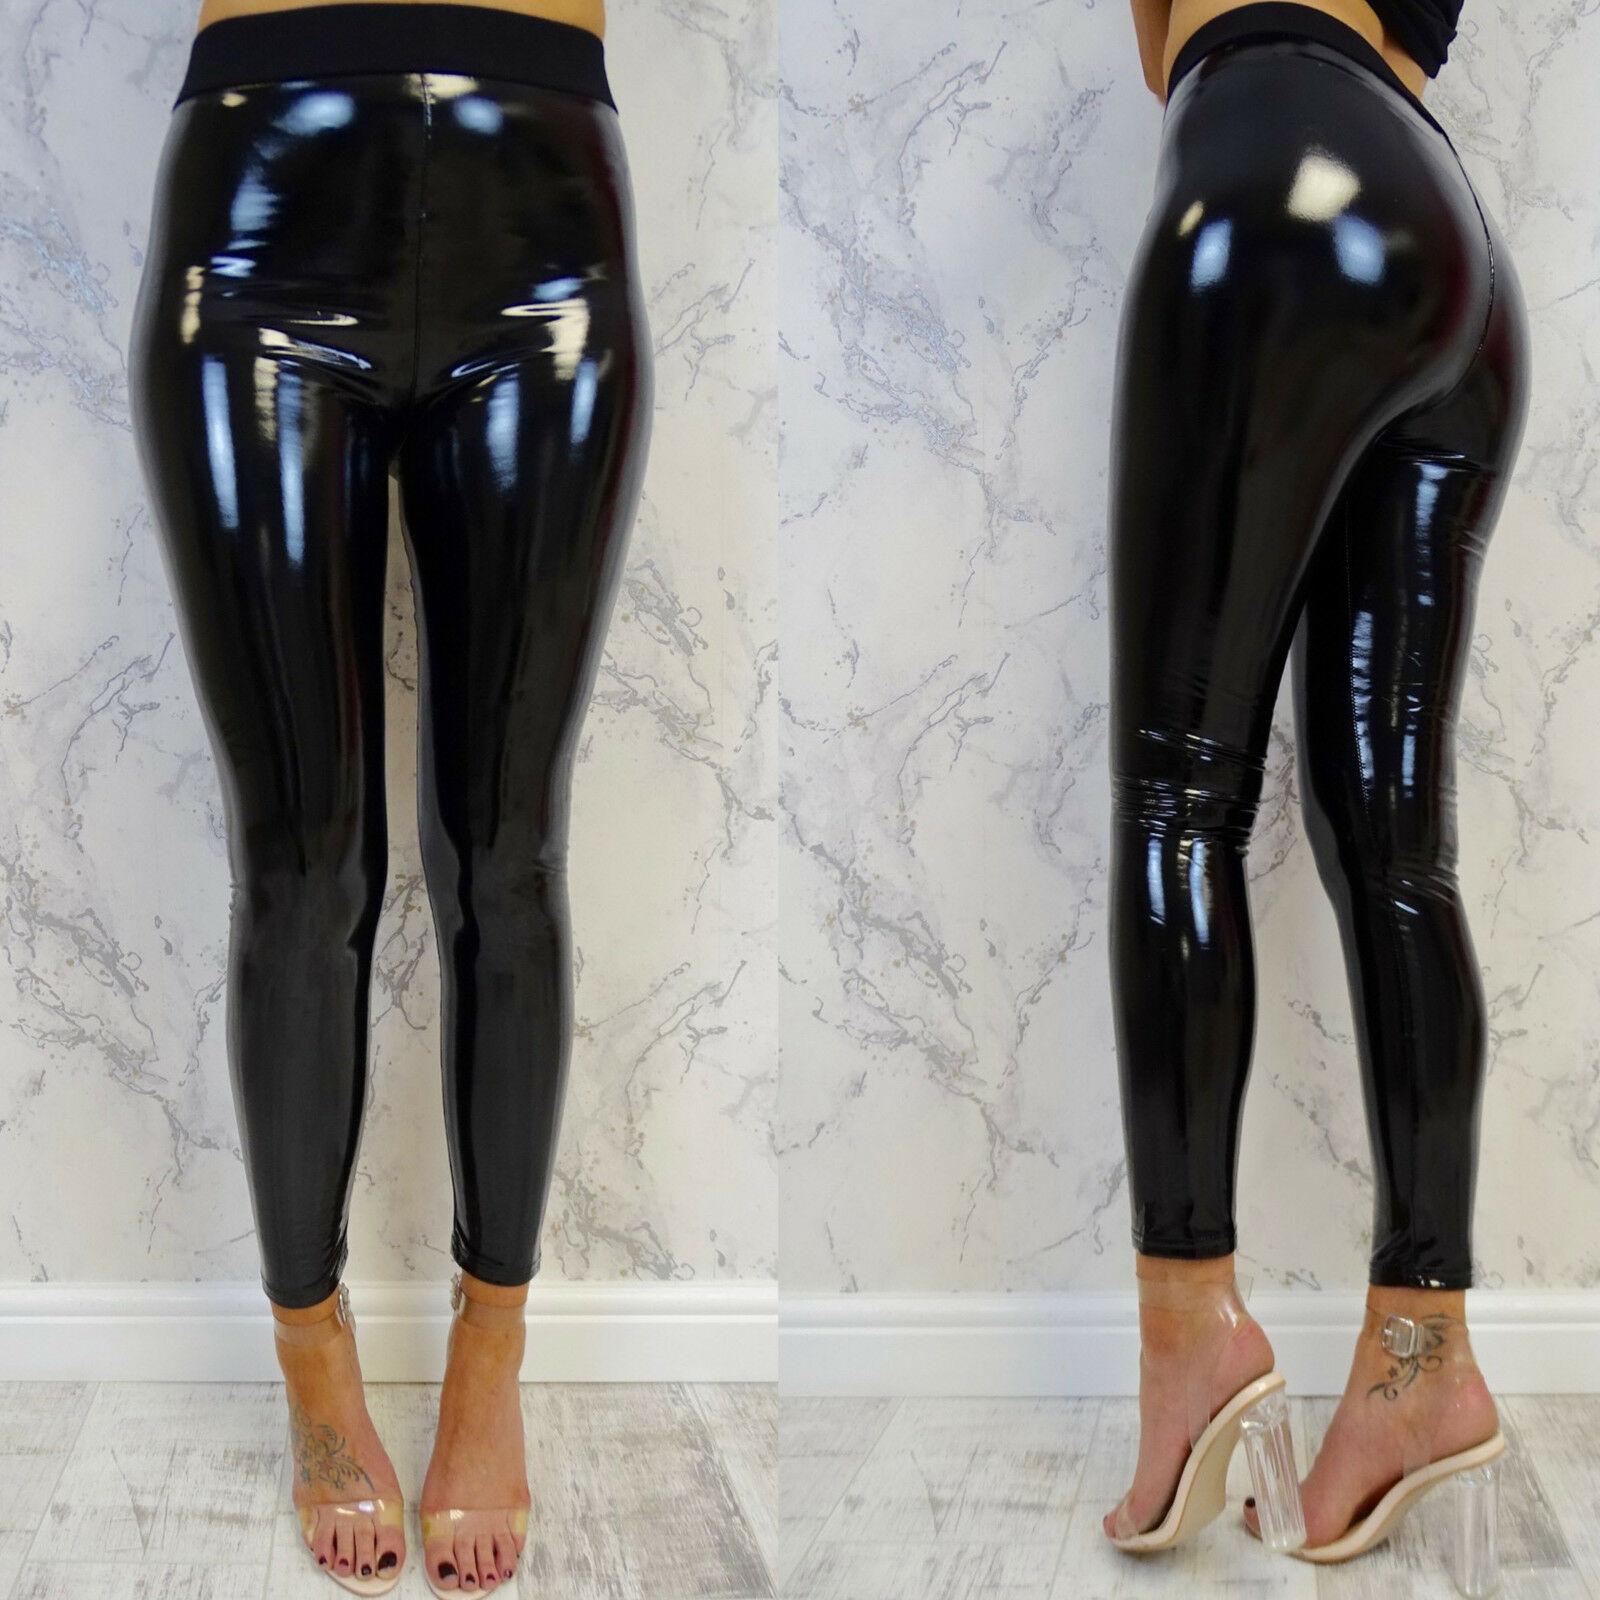 Women Ladies Vinyl PVC Wet Look Shiny Disco Elasticated High Waist Leggings Pant Women's Leather Pants Nightclun Wear